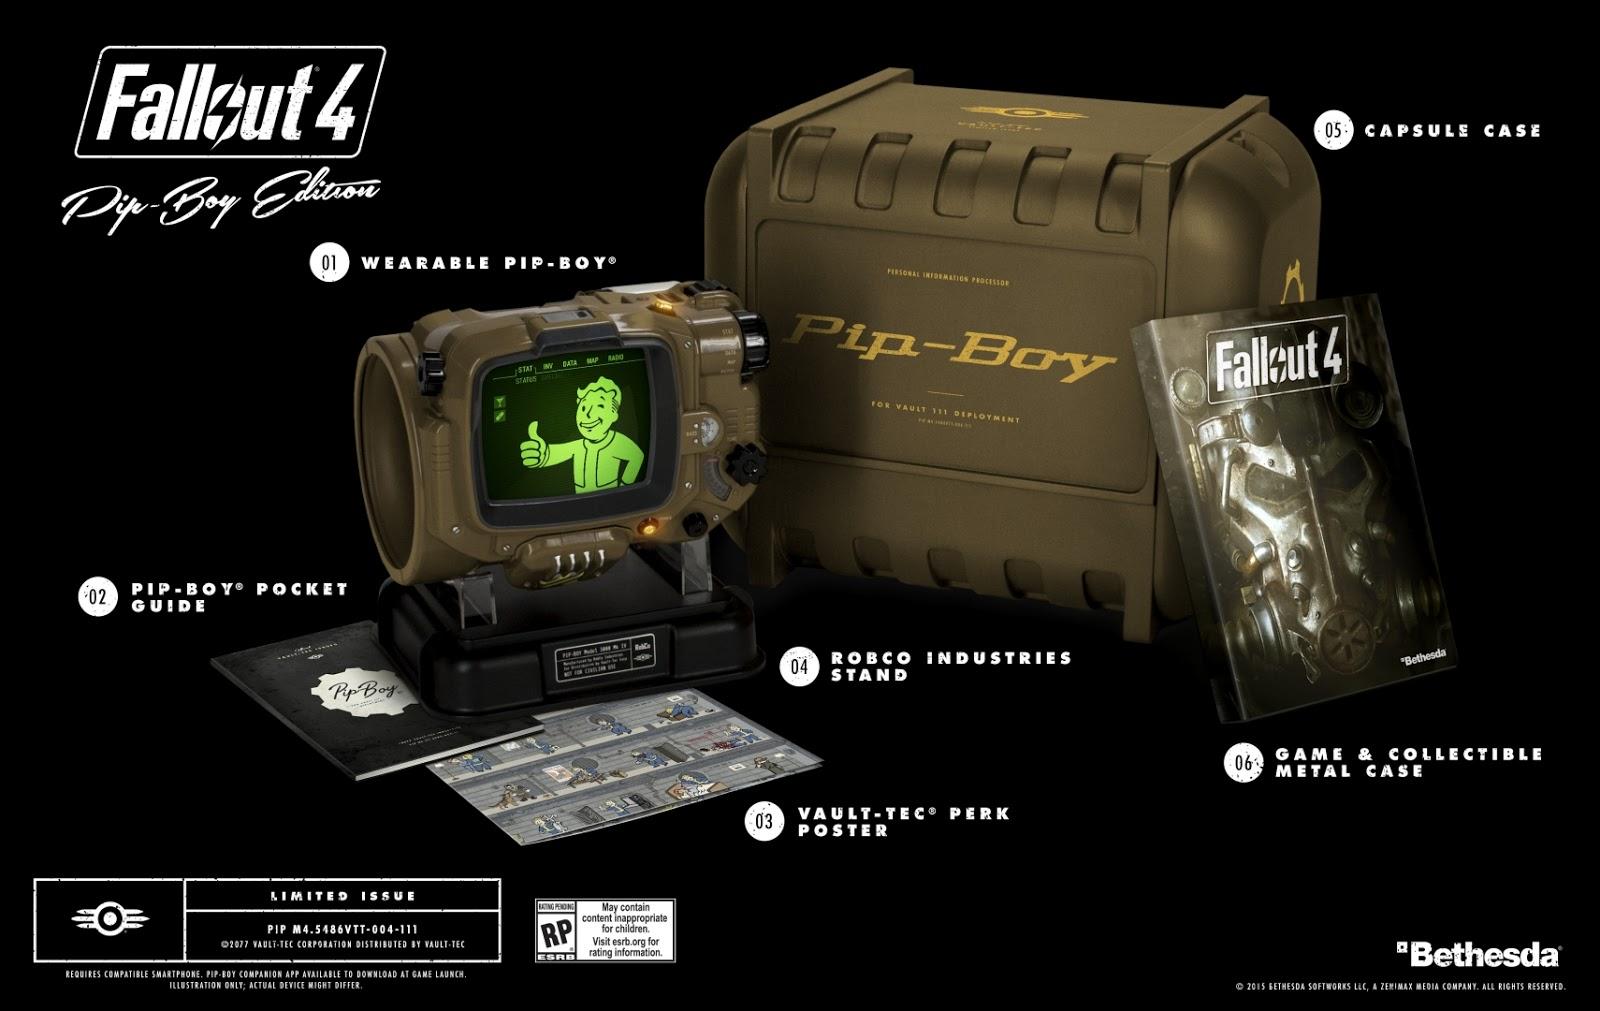 Fallout clipart fallout 1 4 vault hd Fallout boy